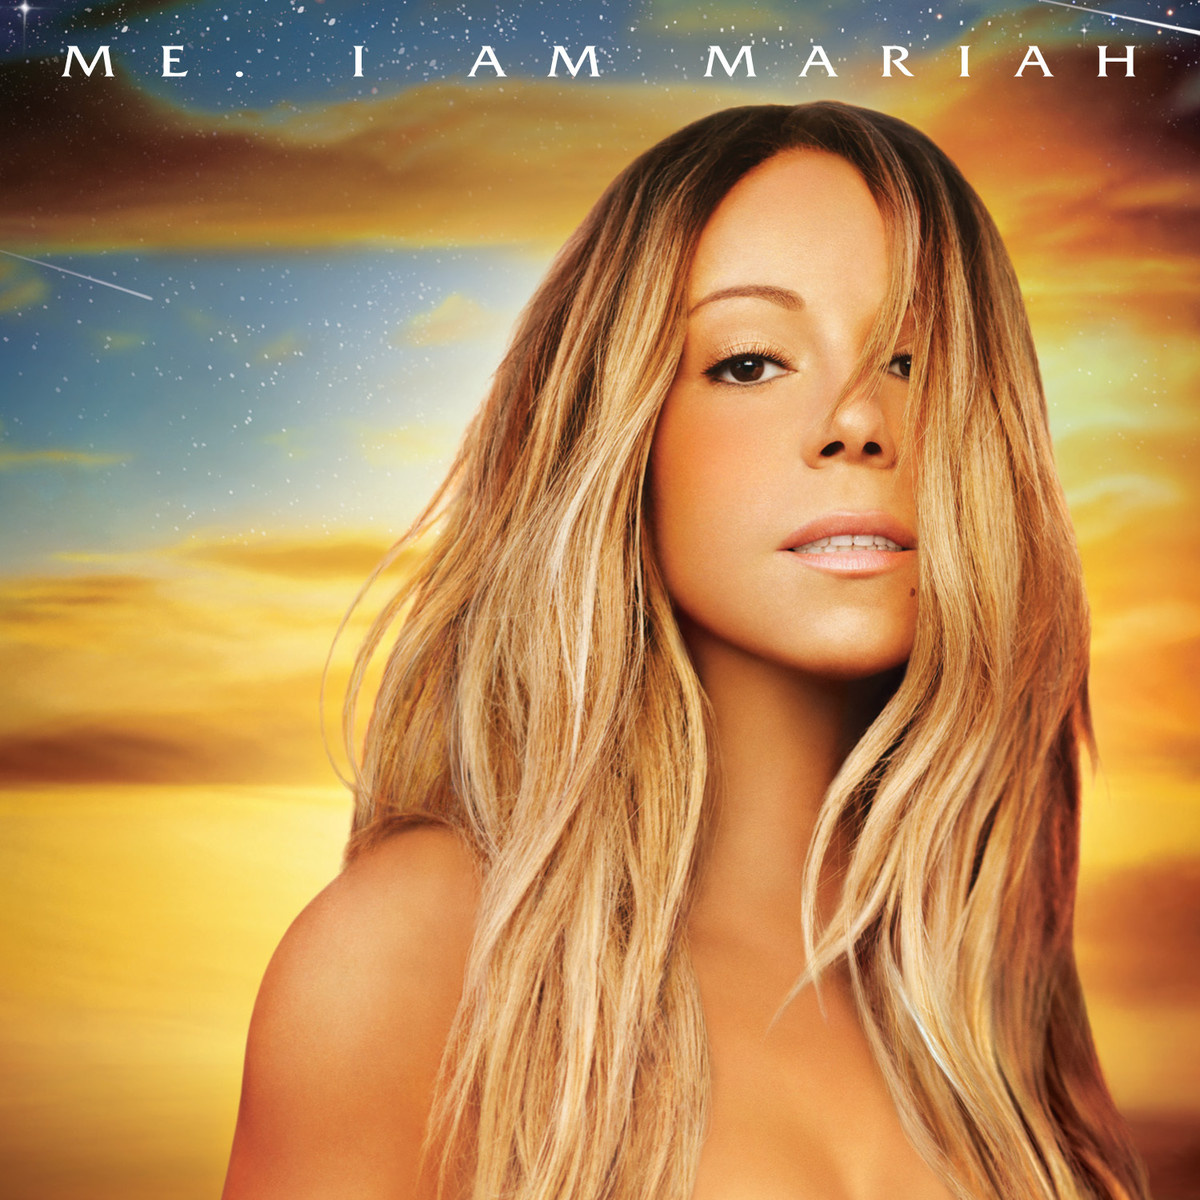 Me. I Am Mariah…The Elusive Chanteuse – Mariah Carey(玛丽亚·凯莉) 专辑 在线试听的照片 - 2